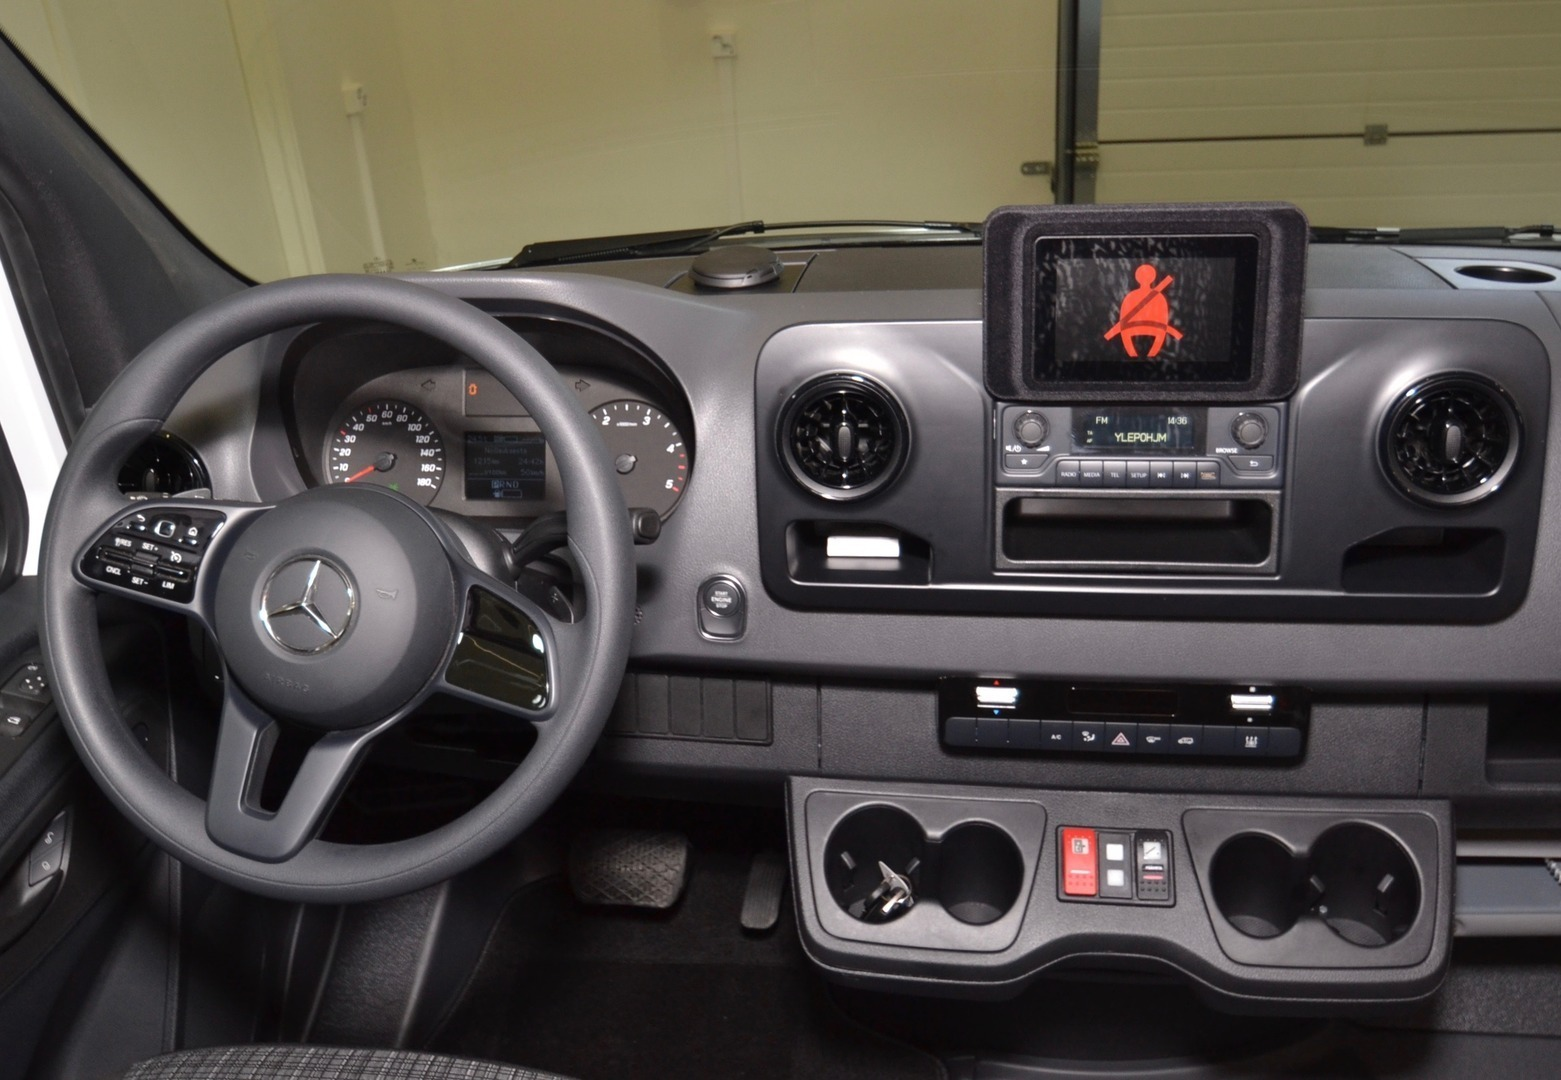 Mercedes-Benz Sprinter 516 CDI, Automet Monikäytt